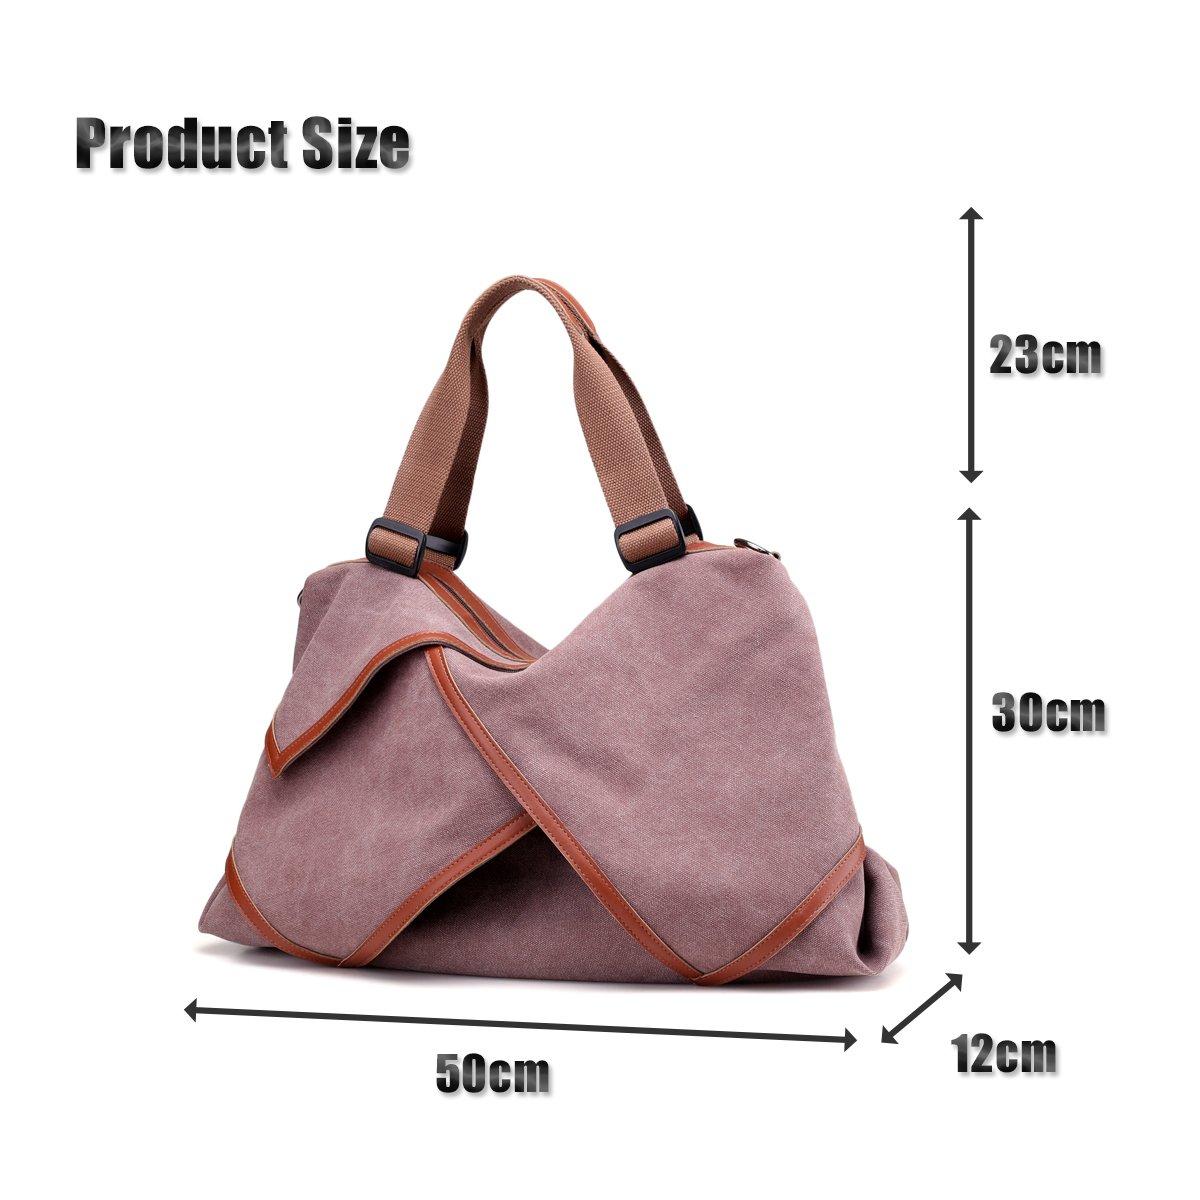 78223d82e19 LOSMILE Women s handbag Canvas Shoulder Bag Large Hobo Tote Bags Ladies Top-Handle  Casual Beach Holiday Weekend Bags. (Purple)  Amazon.co.uk  Shoes   Bags